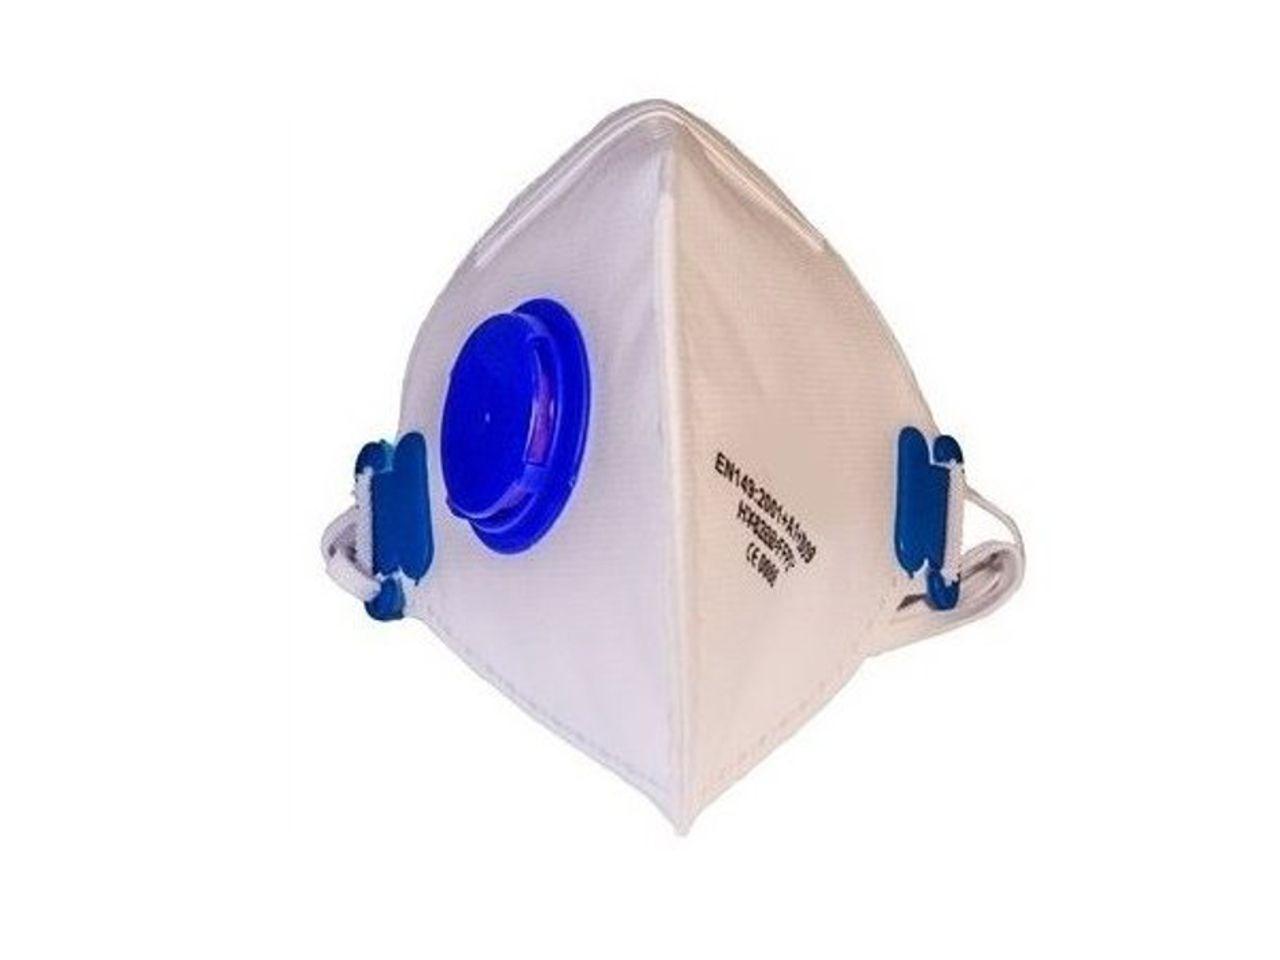 Respirátor BAMAX HY8226 s ventilem, FFP2   CHAT on-line podpora PO-PÁ 8-22.00!!